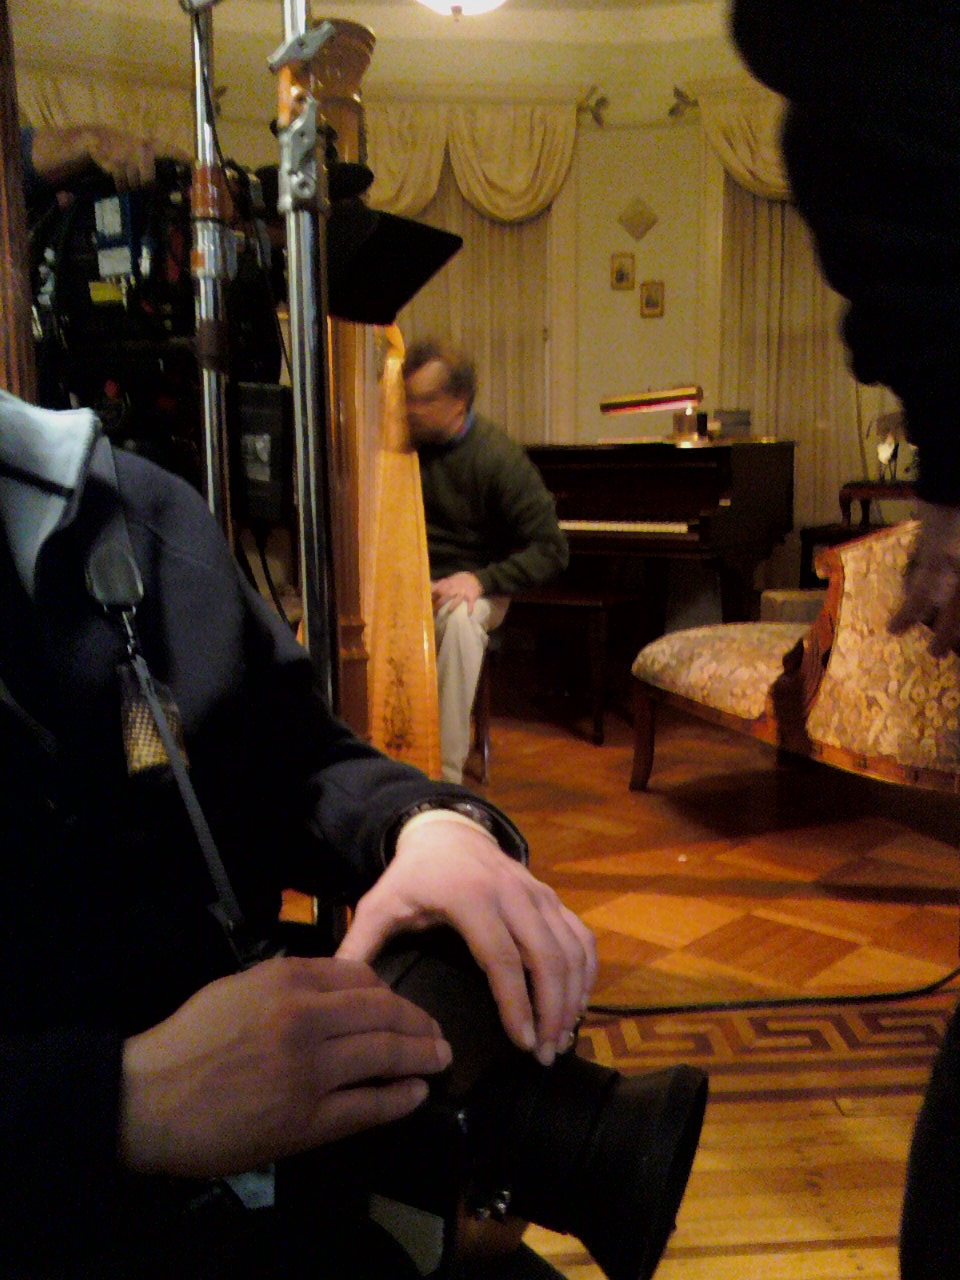 Mia's vintage style 15 Lyon and Healy harp